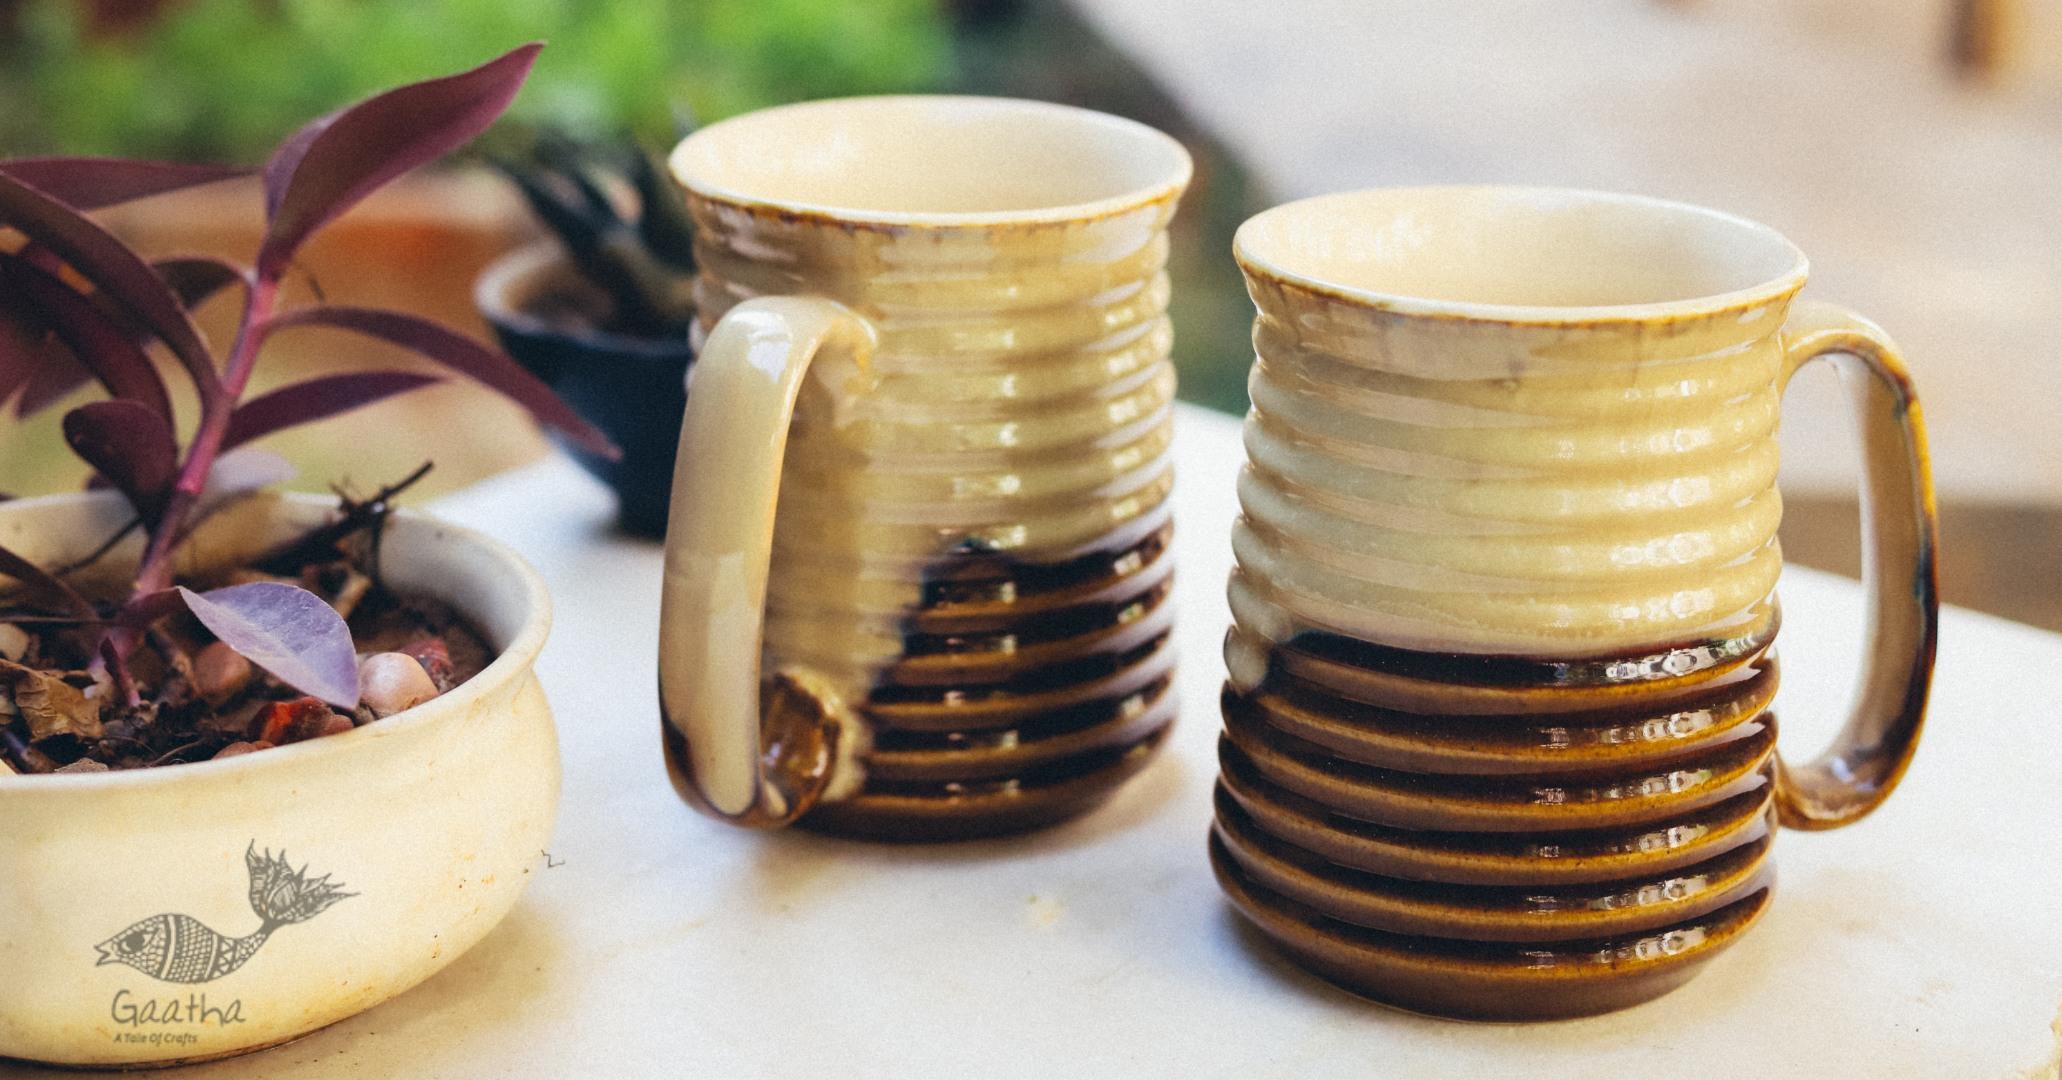 Buy Khurja Pottery Ceramic Beer Mug